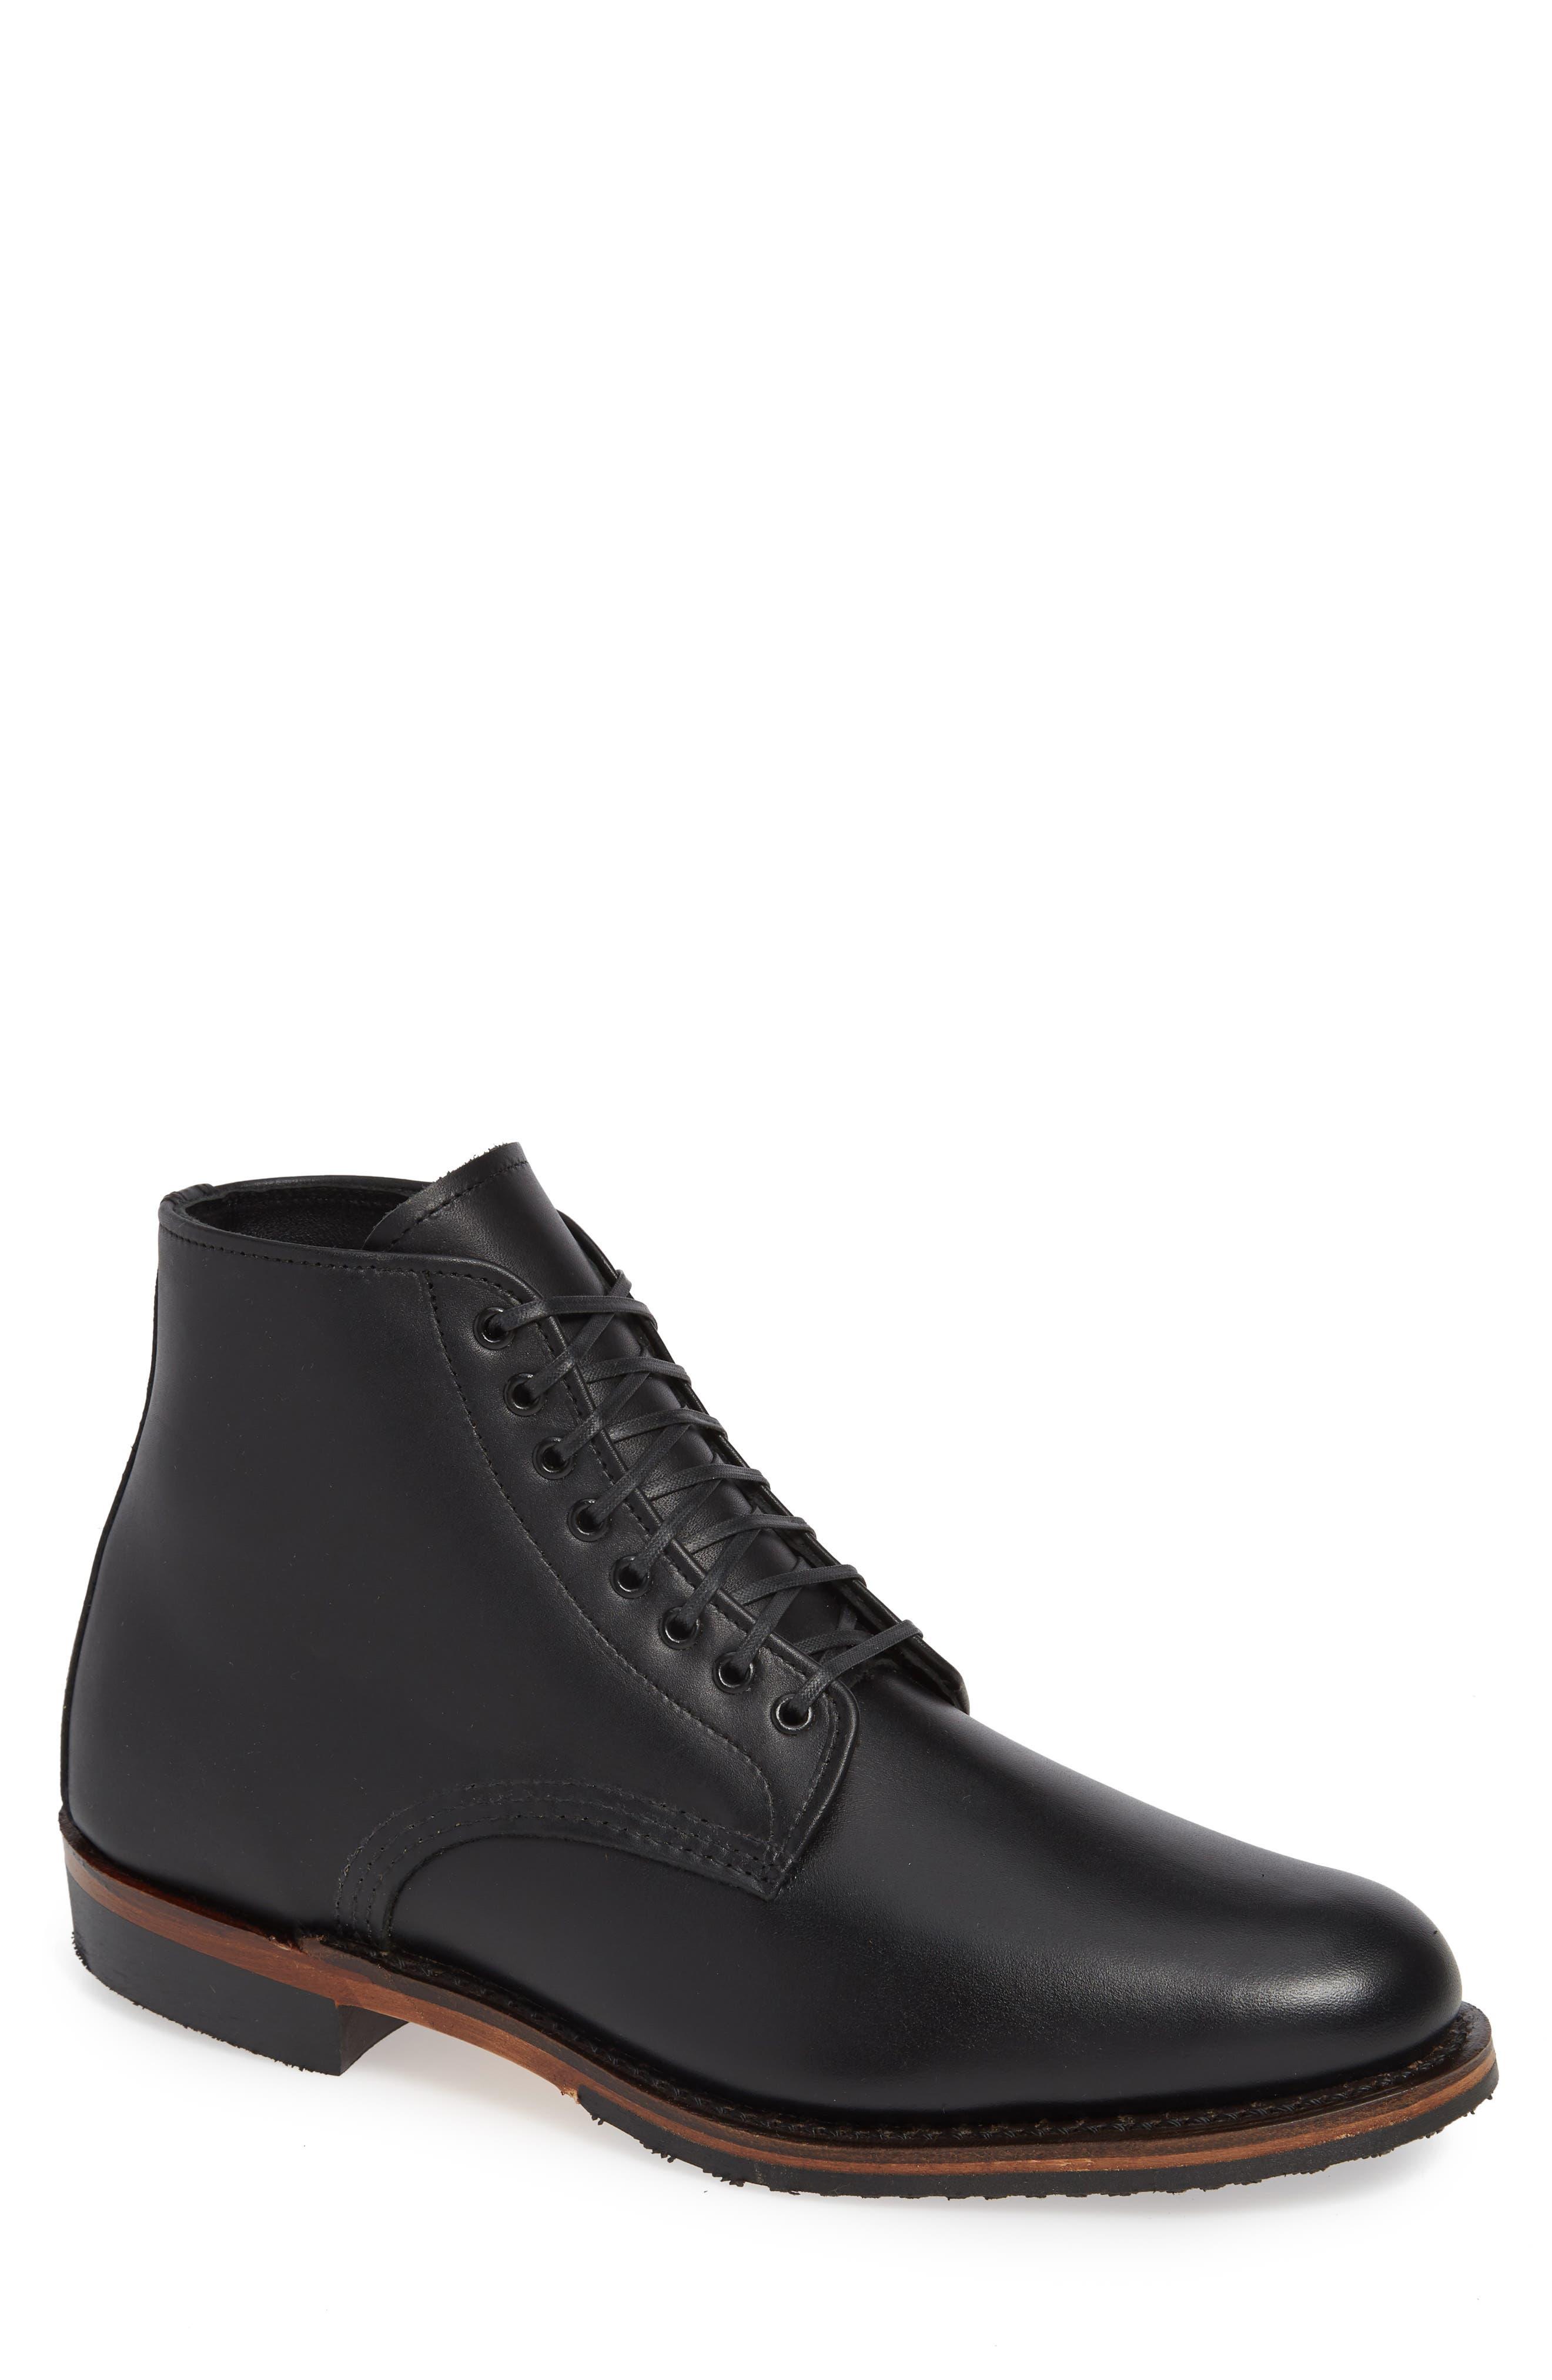 Williston Plain Toe Boot, Main, color, BLACK LEATHER